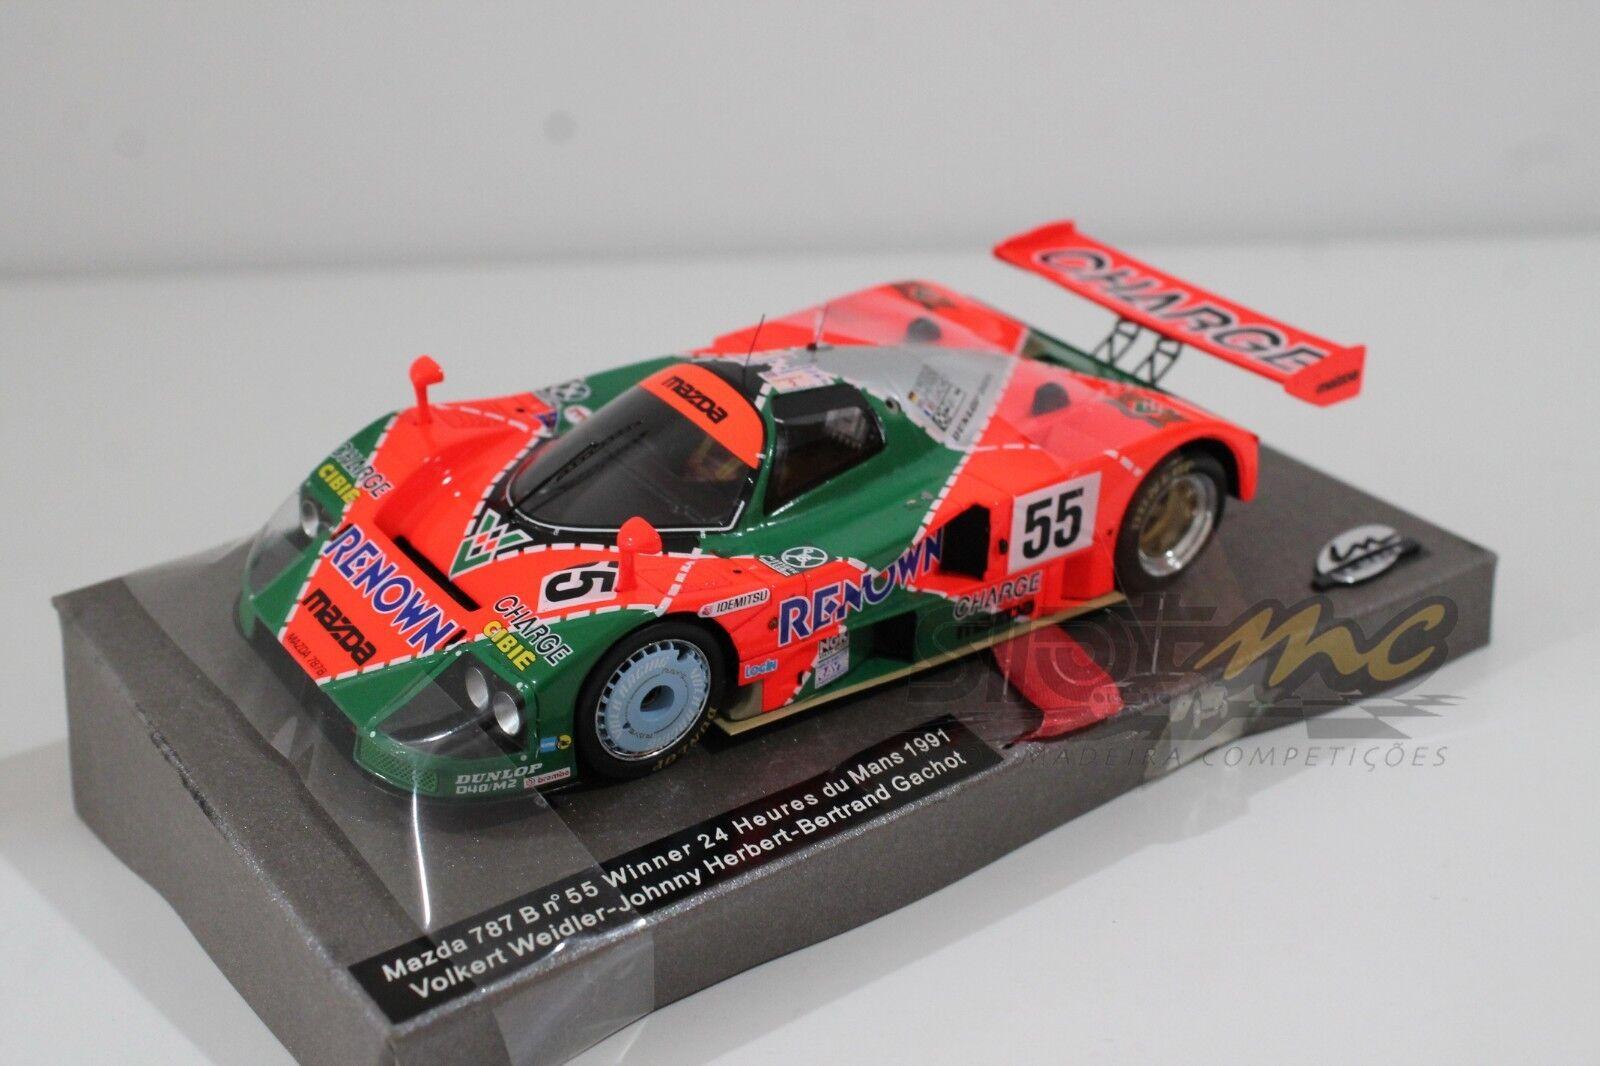 Le Mans Miniatures 132026M Mazda 787B Le Mans 1991 Winner 1 32   NEW